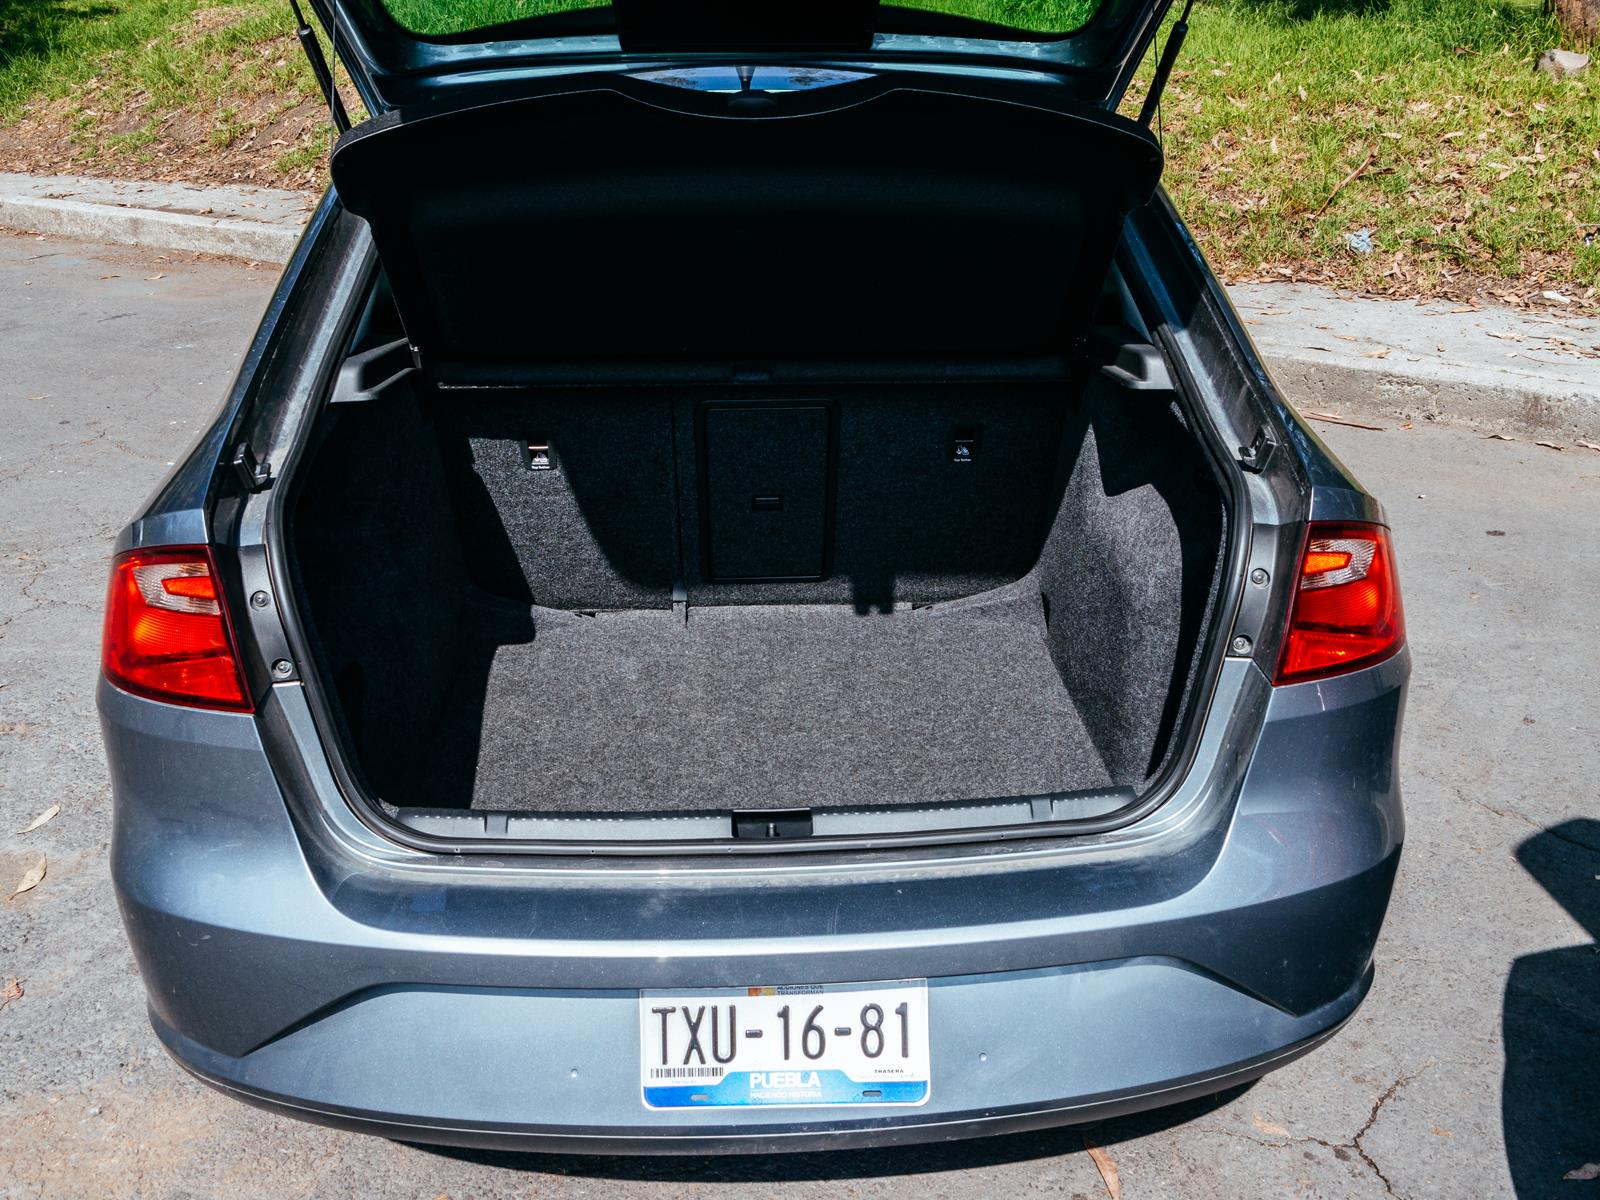 Comparativa: Nissan Versa vs SEAT Toledo - Autocosmos.com